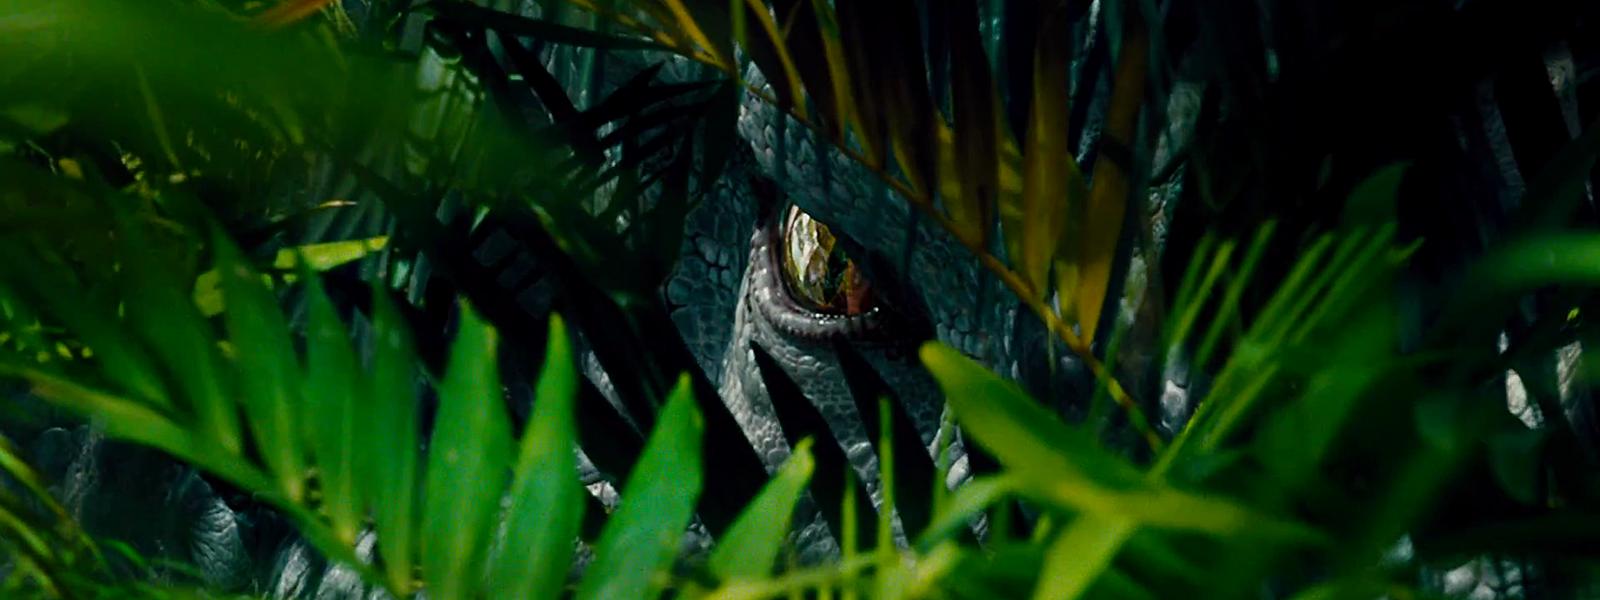 Jurassic World – Official Global Trailer